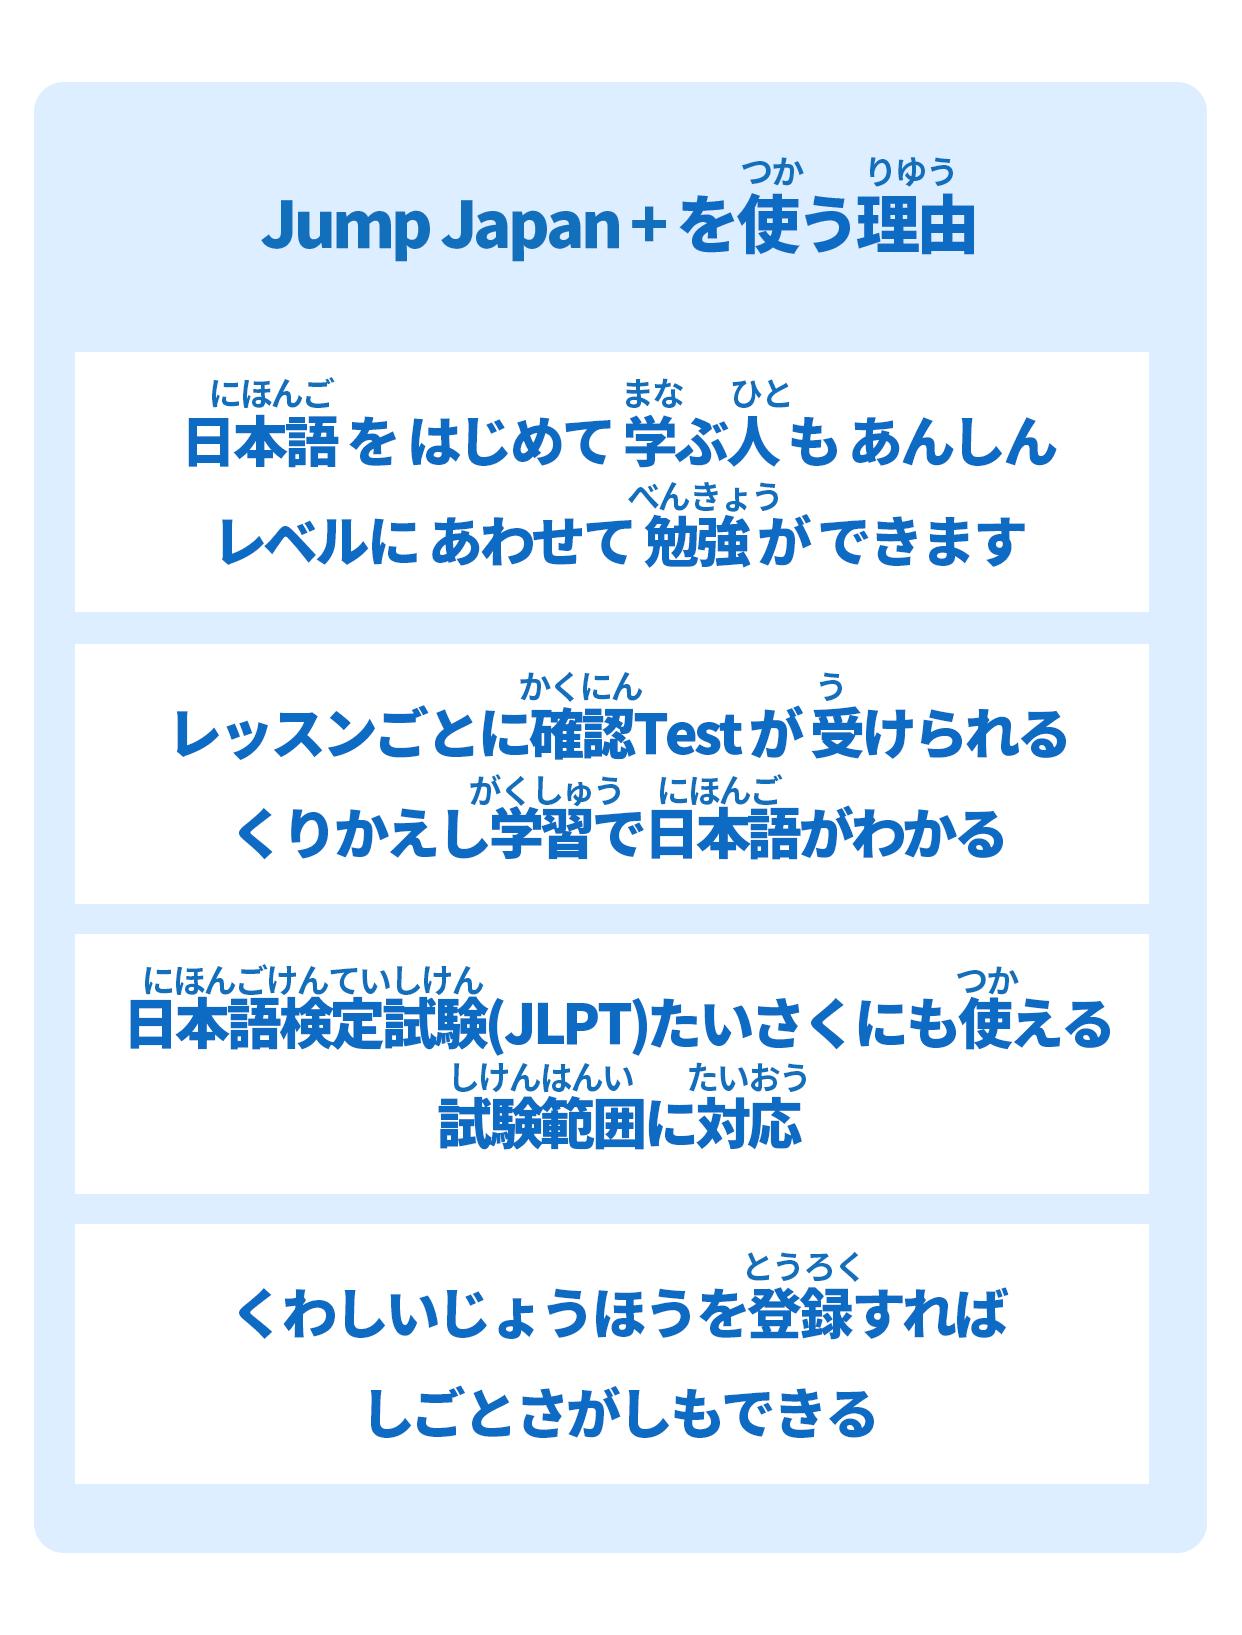 JumpJpanaを使う理由